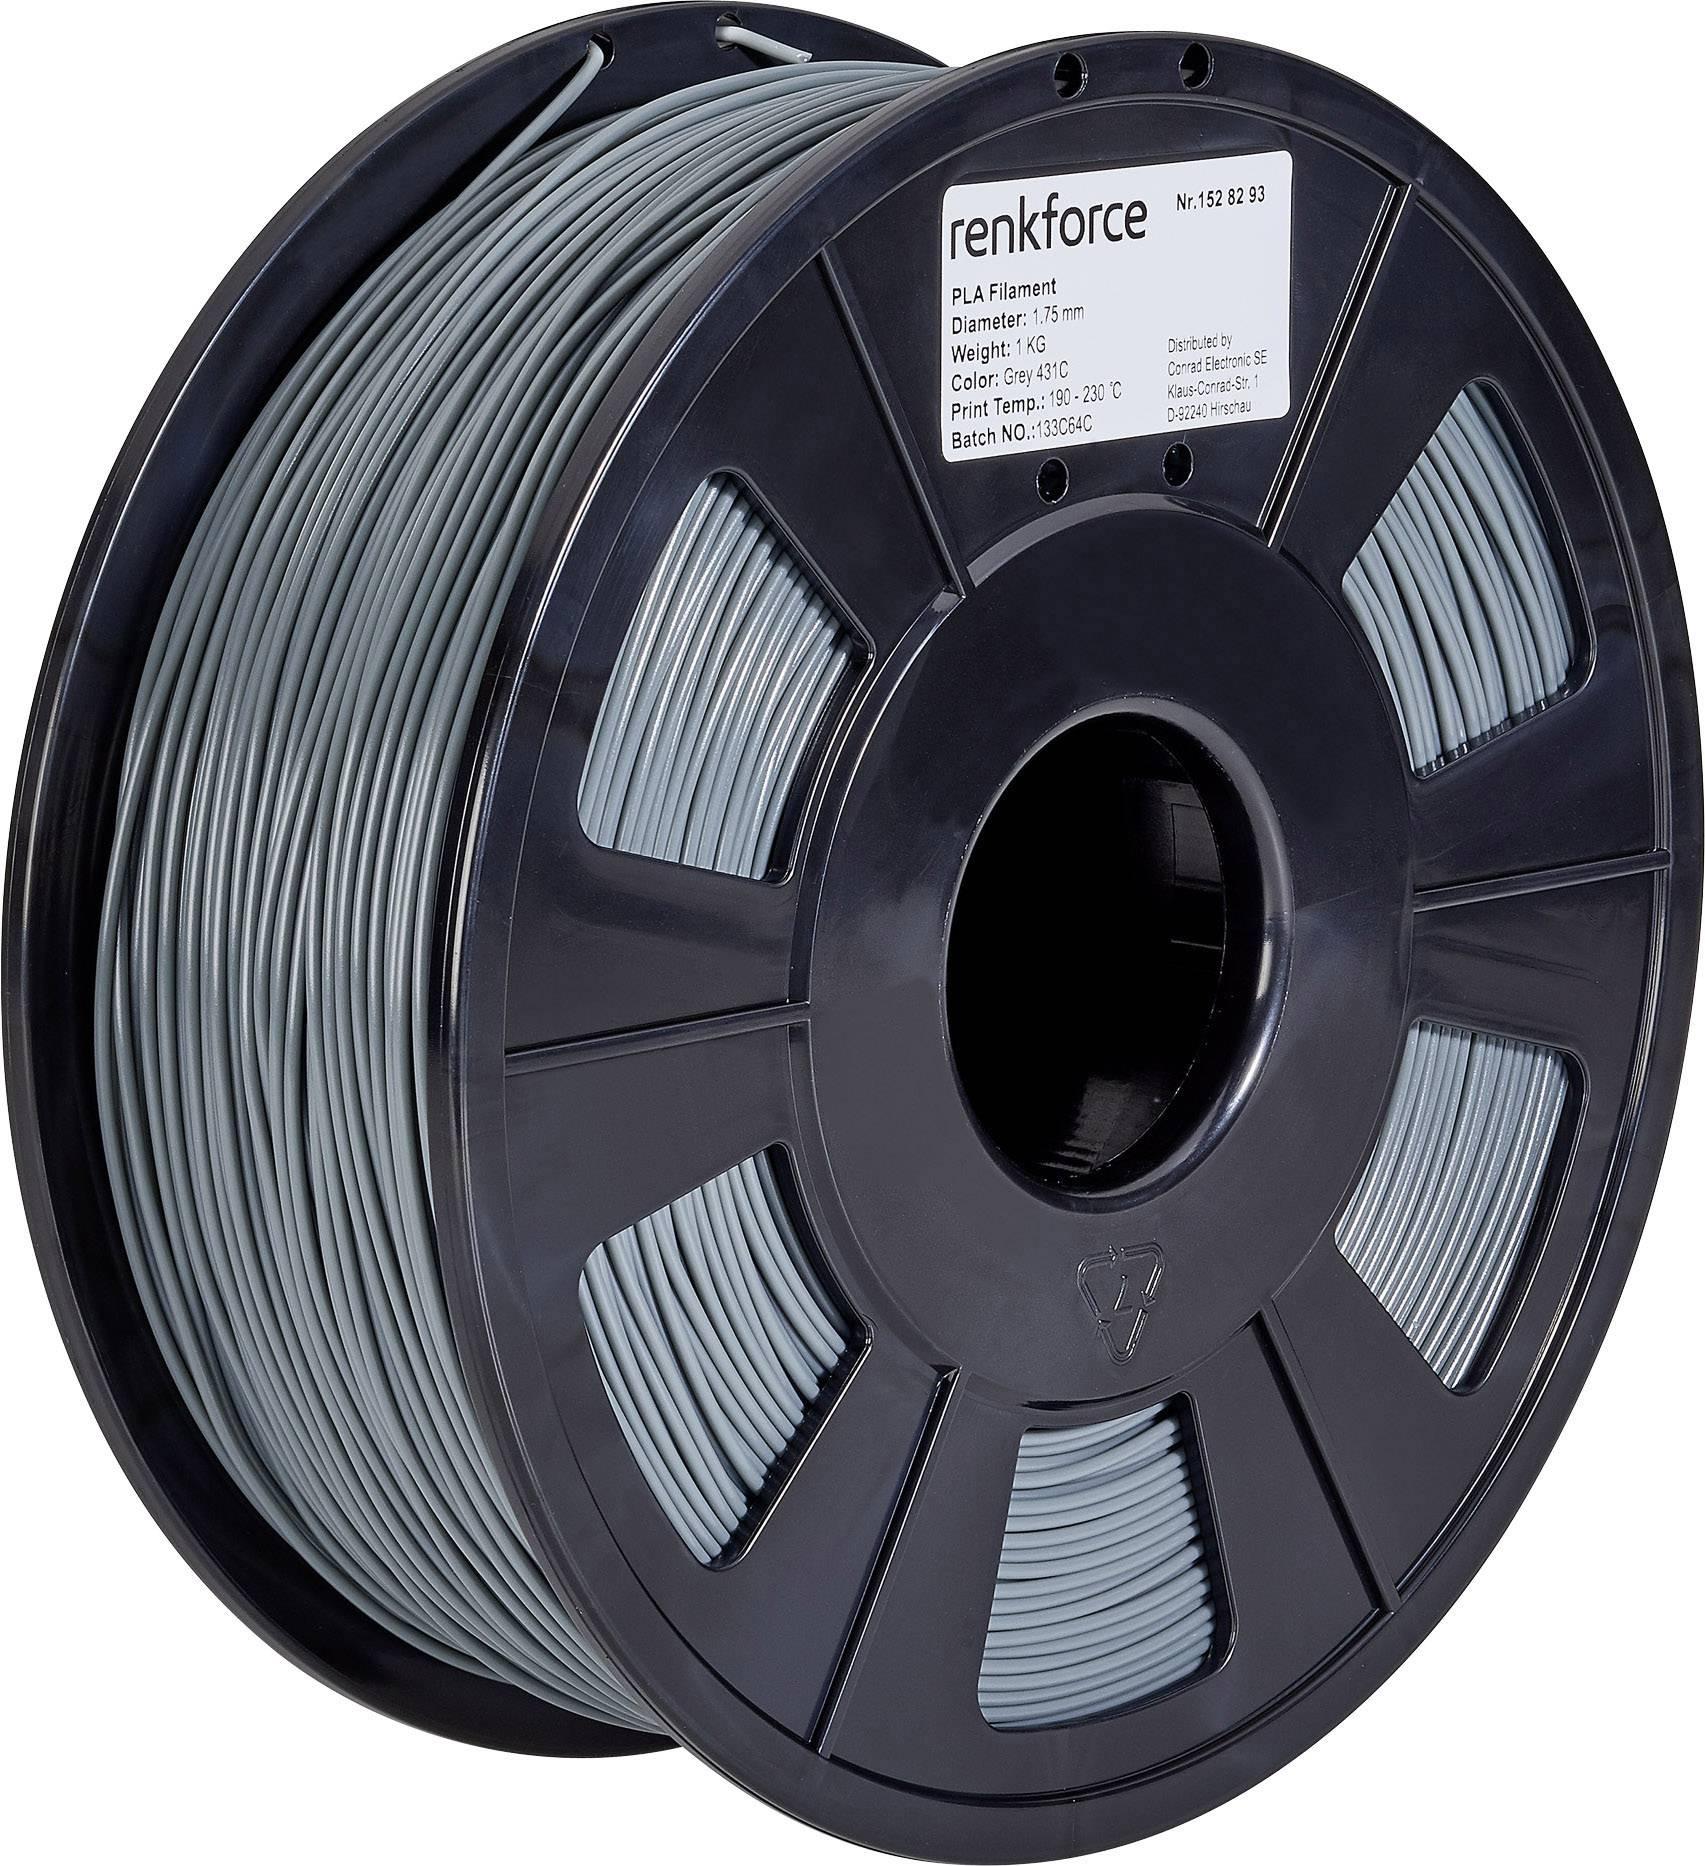 Vlákno pre 3Dtlačiarne, Renkforce 01.04.01.1115, PLA plast , 1.75 mm, 1 kg, sivá